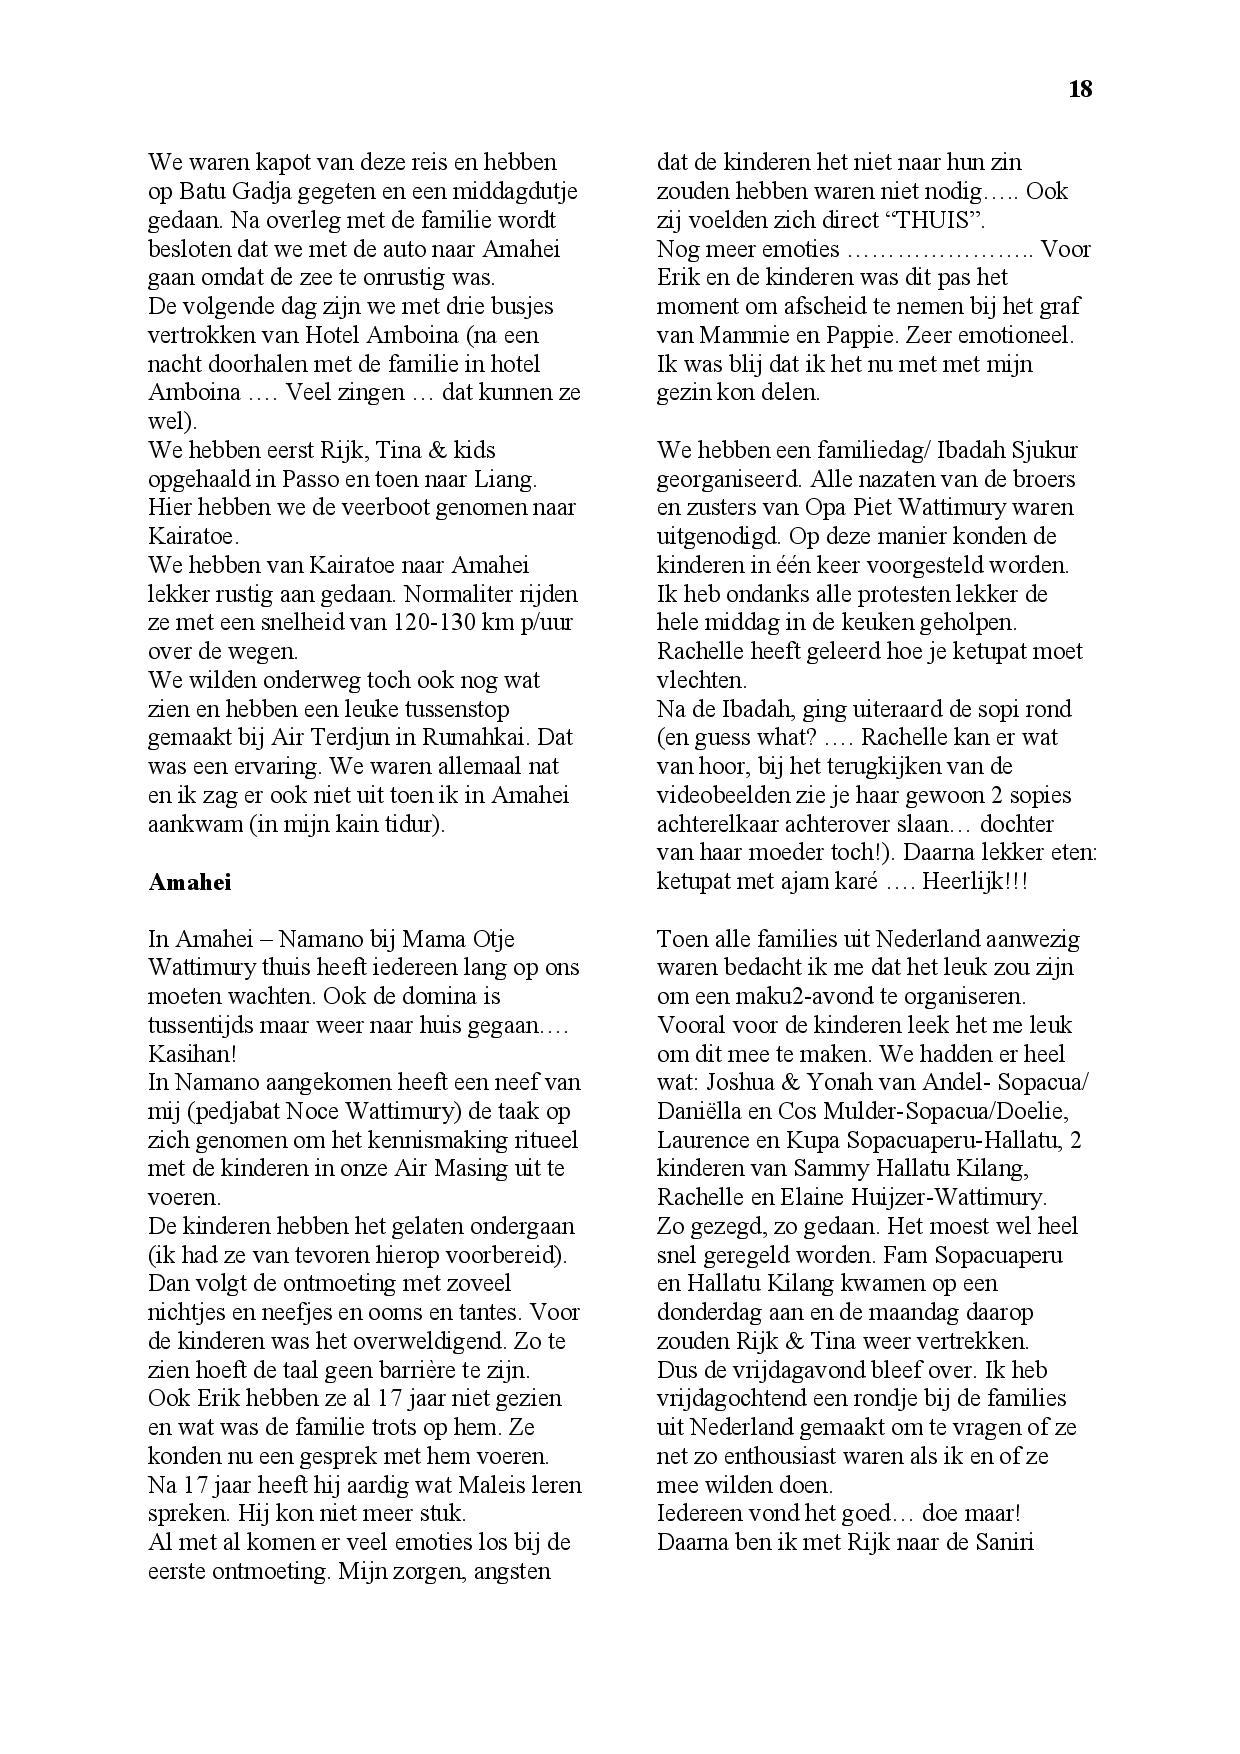 Saka Mese 3e jaargang nr. 02-2007 definitieve webversie-page-018